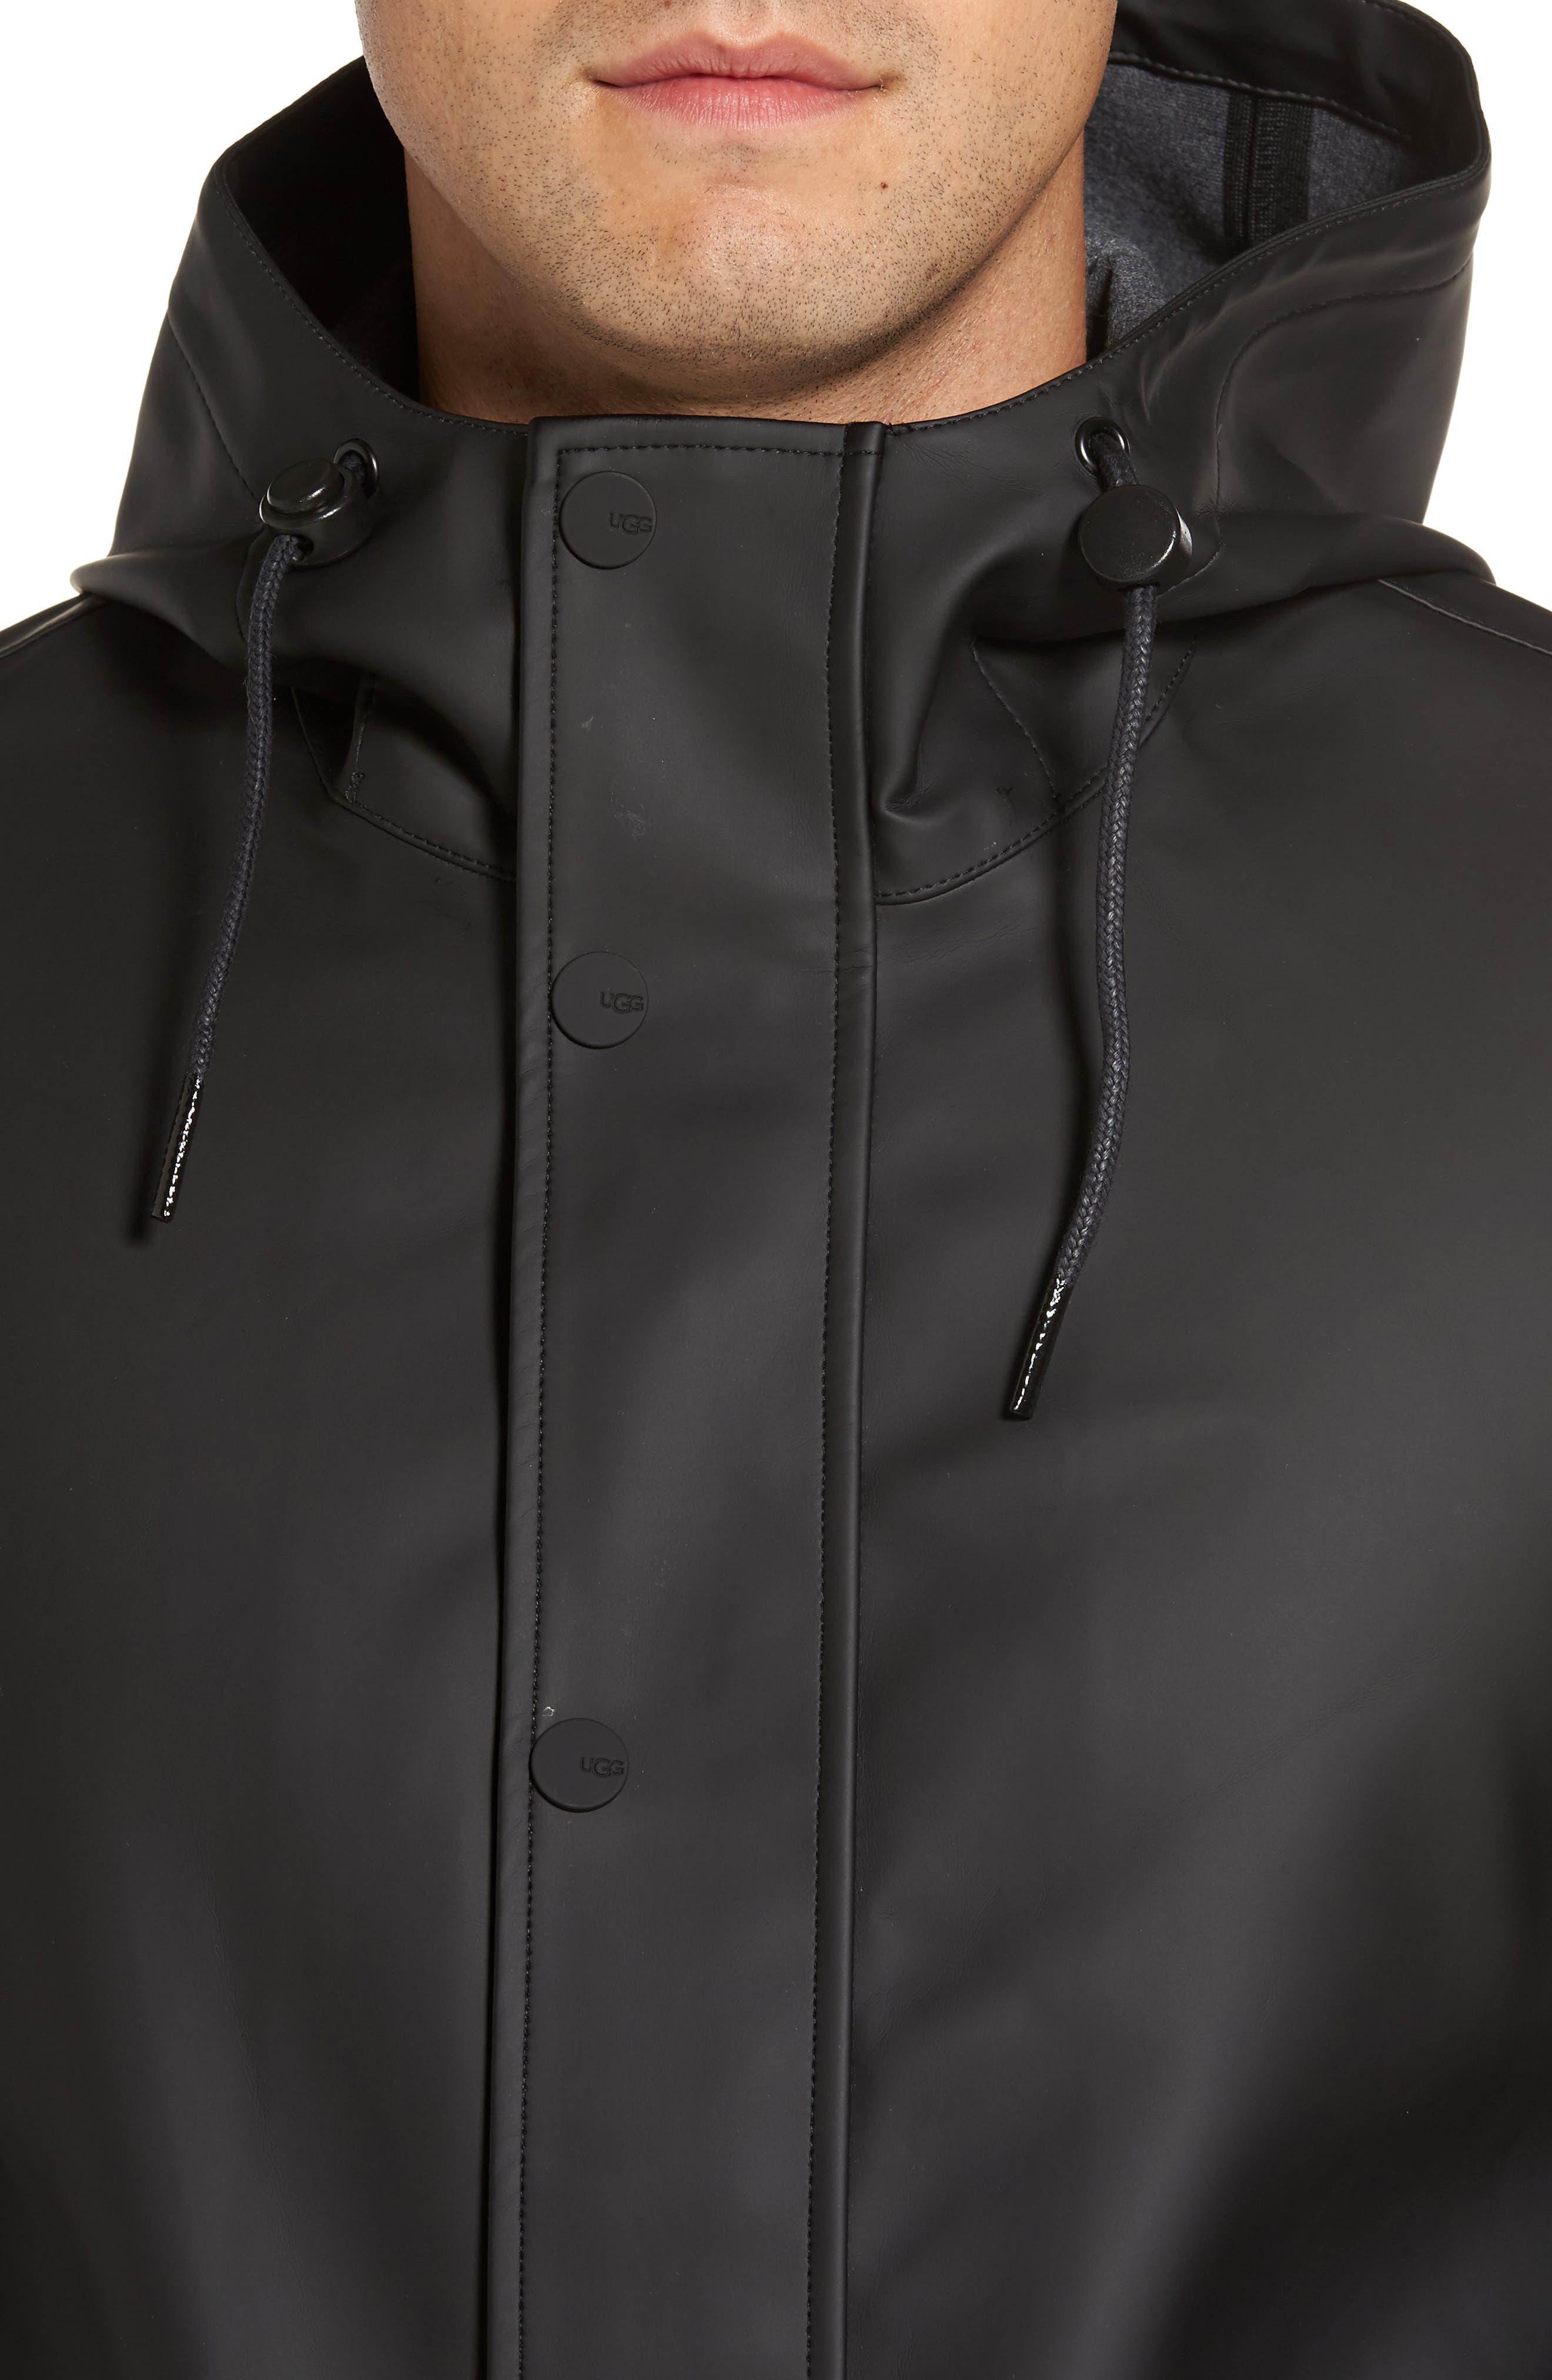 Hooded Raincoat,                             Alternate thumbnail 4, color,                             001